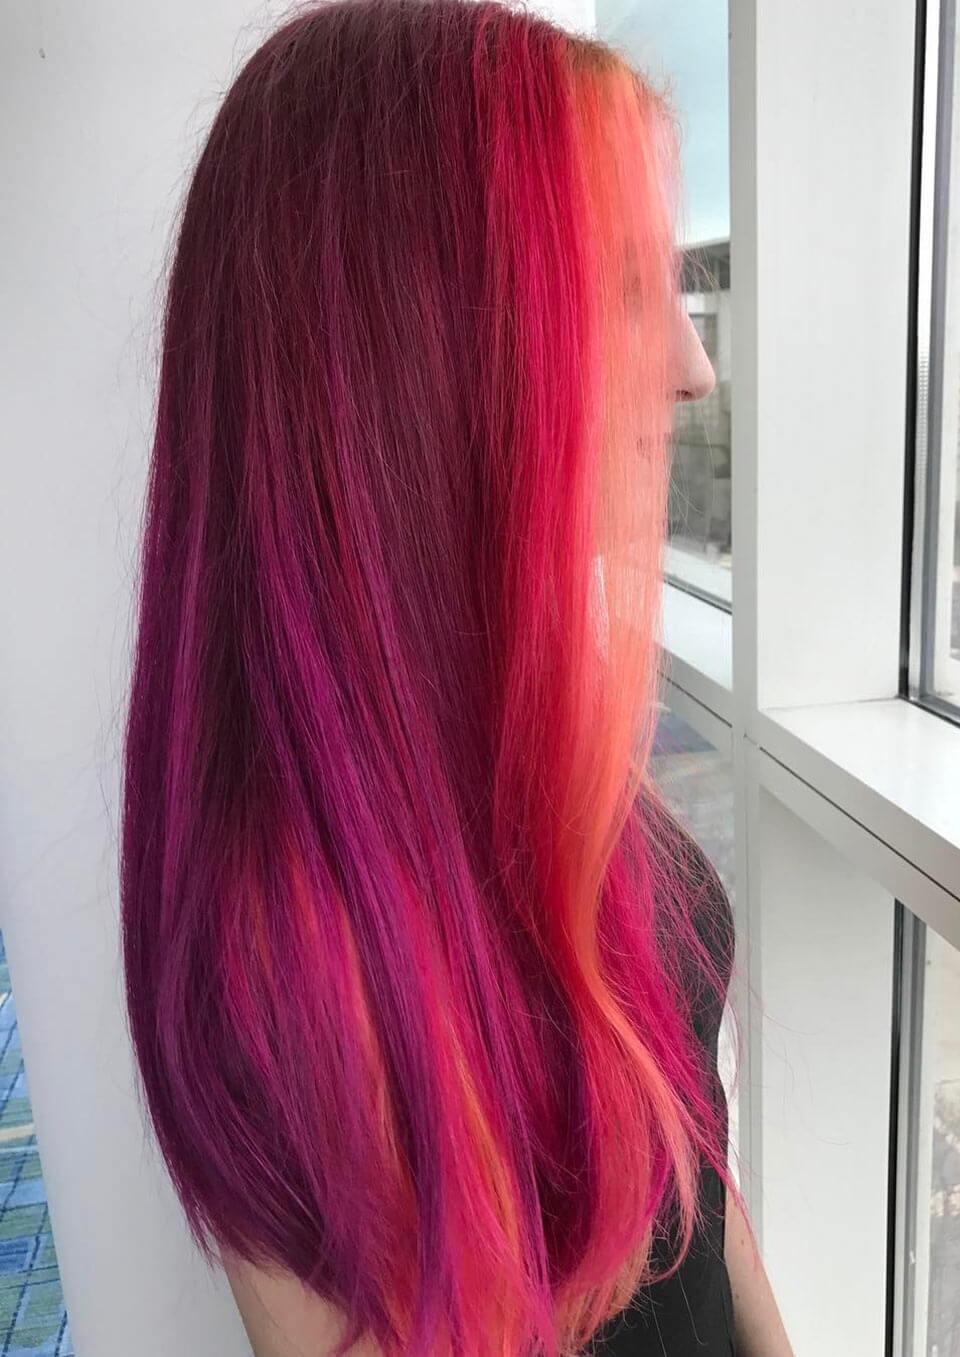 Cabelo rosa vibrante